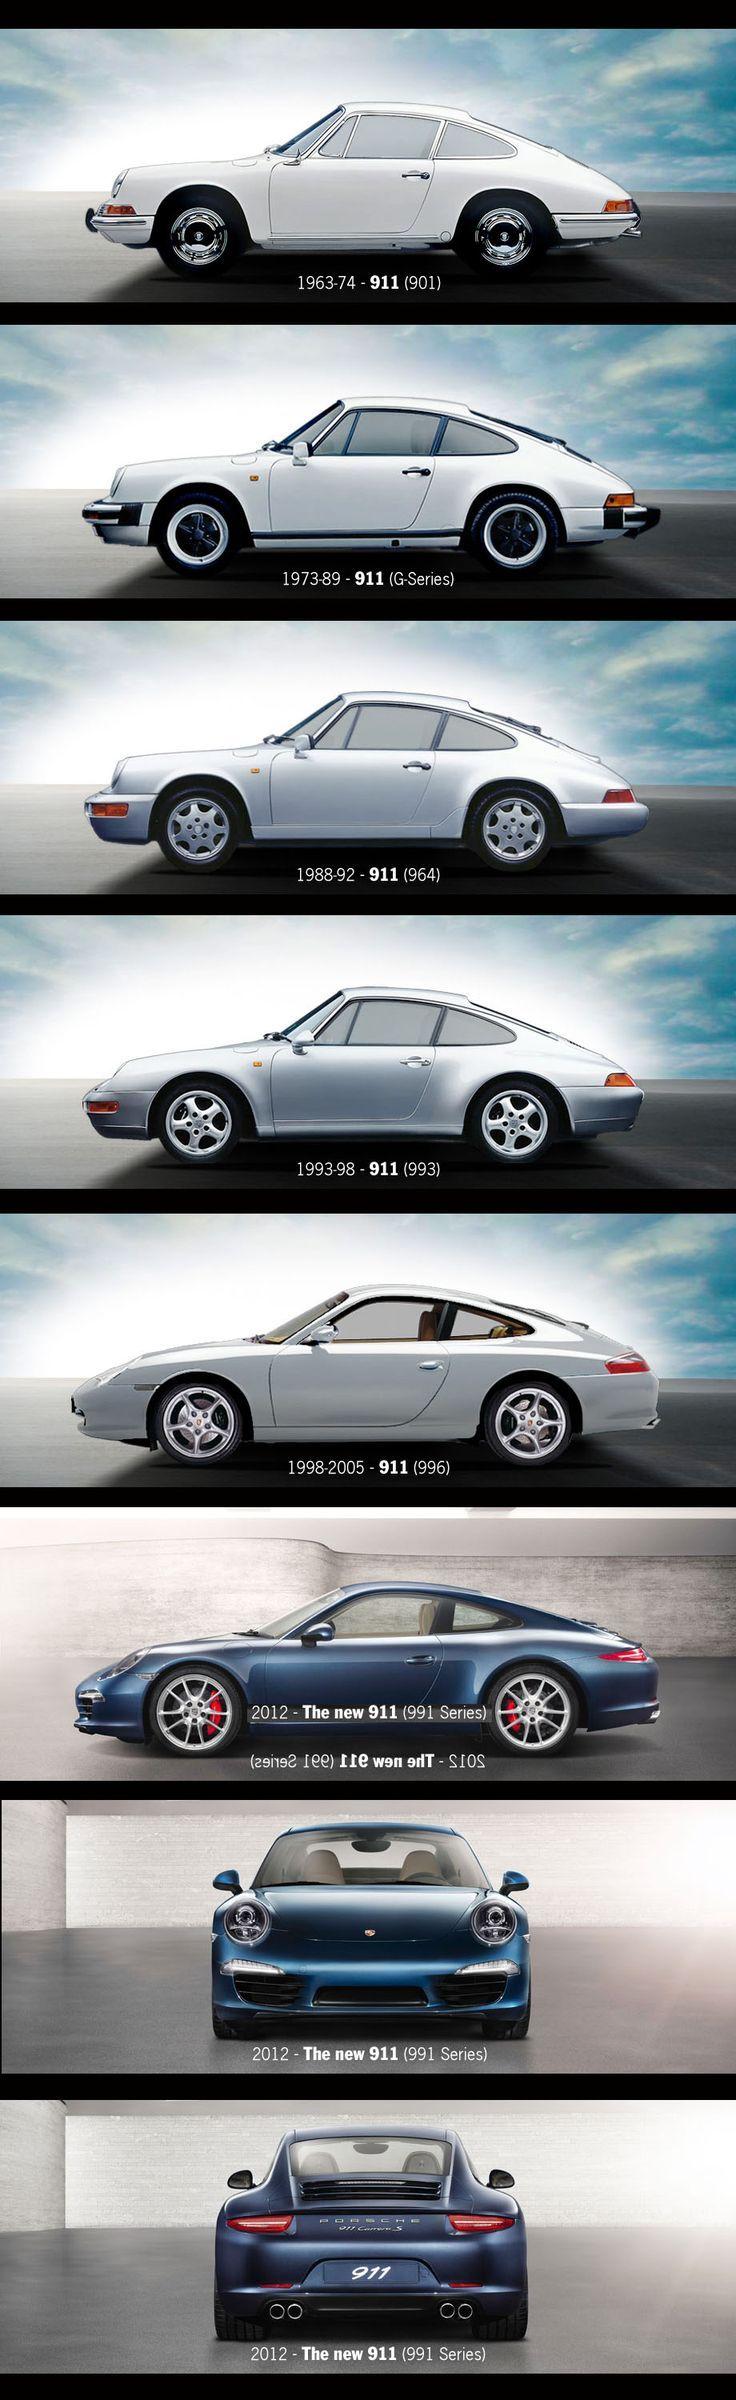 911 - https://www.luxury.guugles.com/911-9/